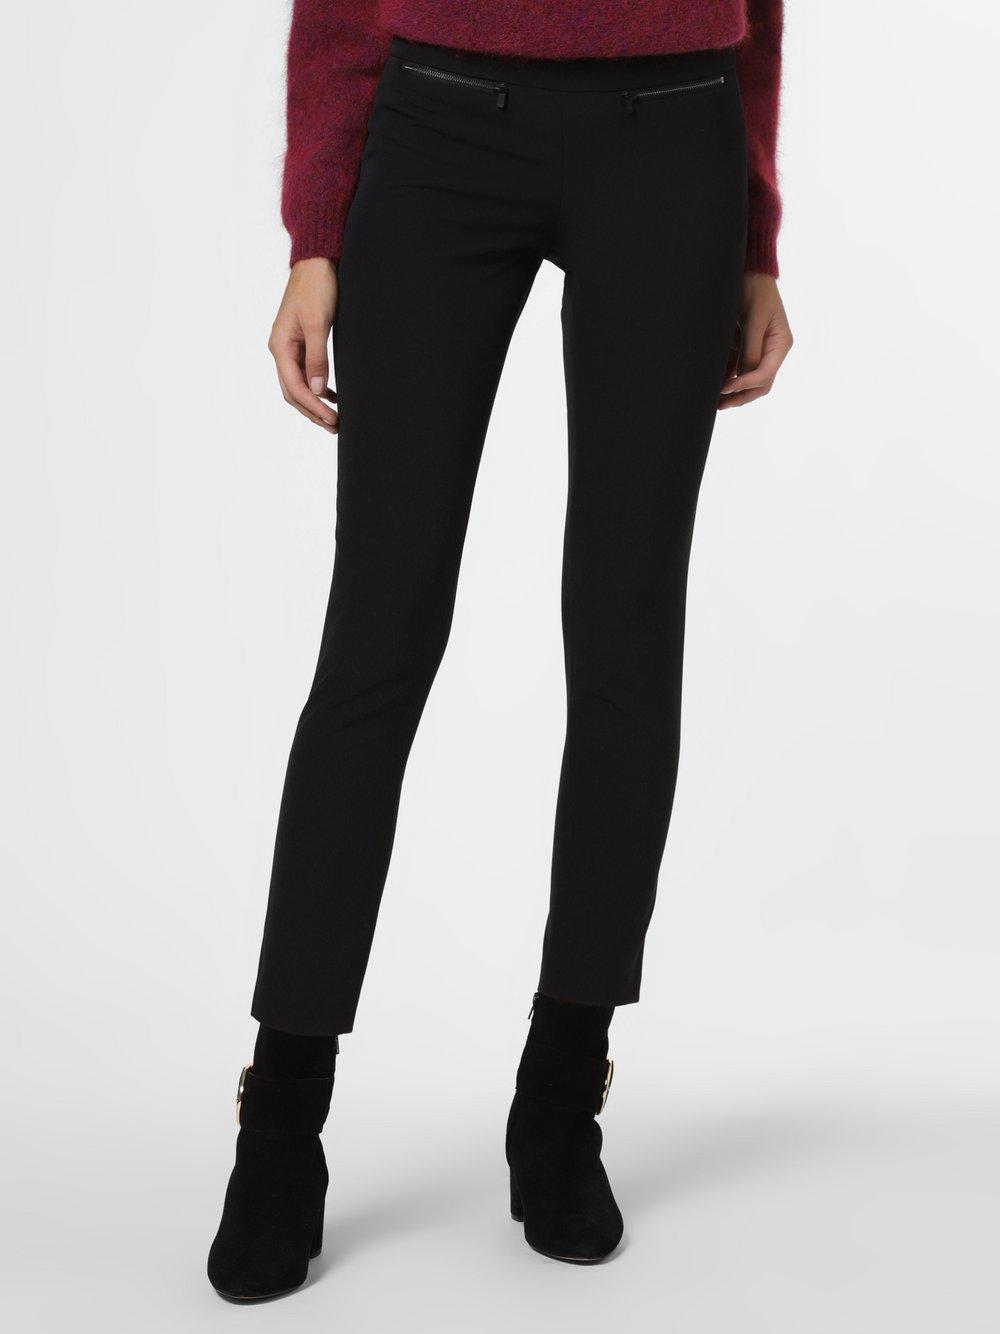 STEFFEN SCHRAUT – Spodnie damskie, czarny Van Graaf 479496-0001-00440